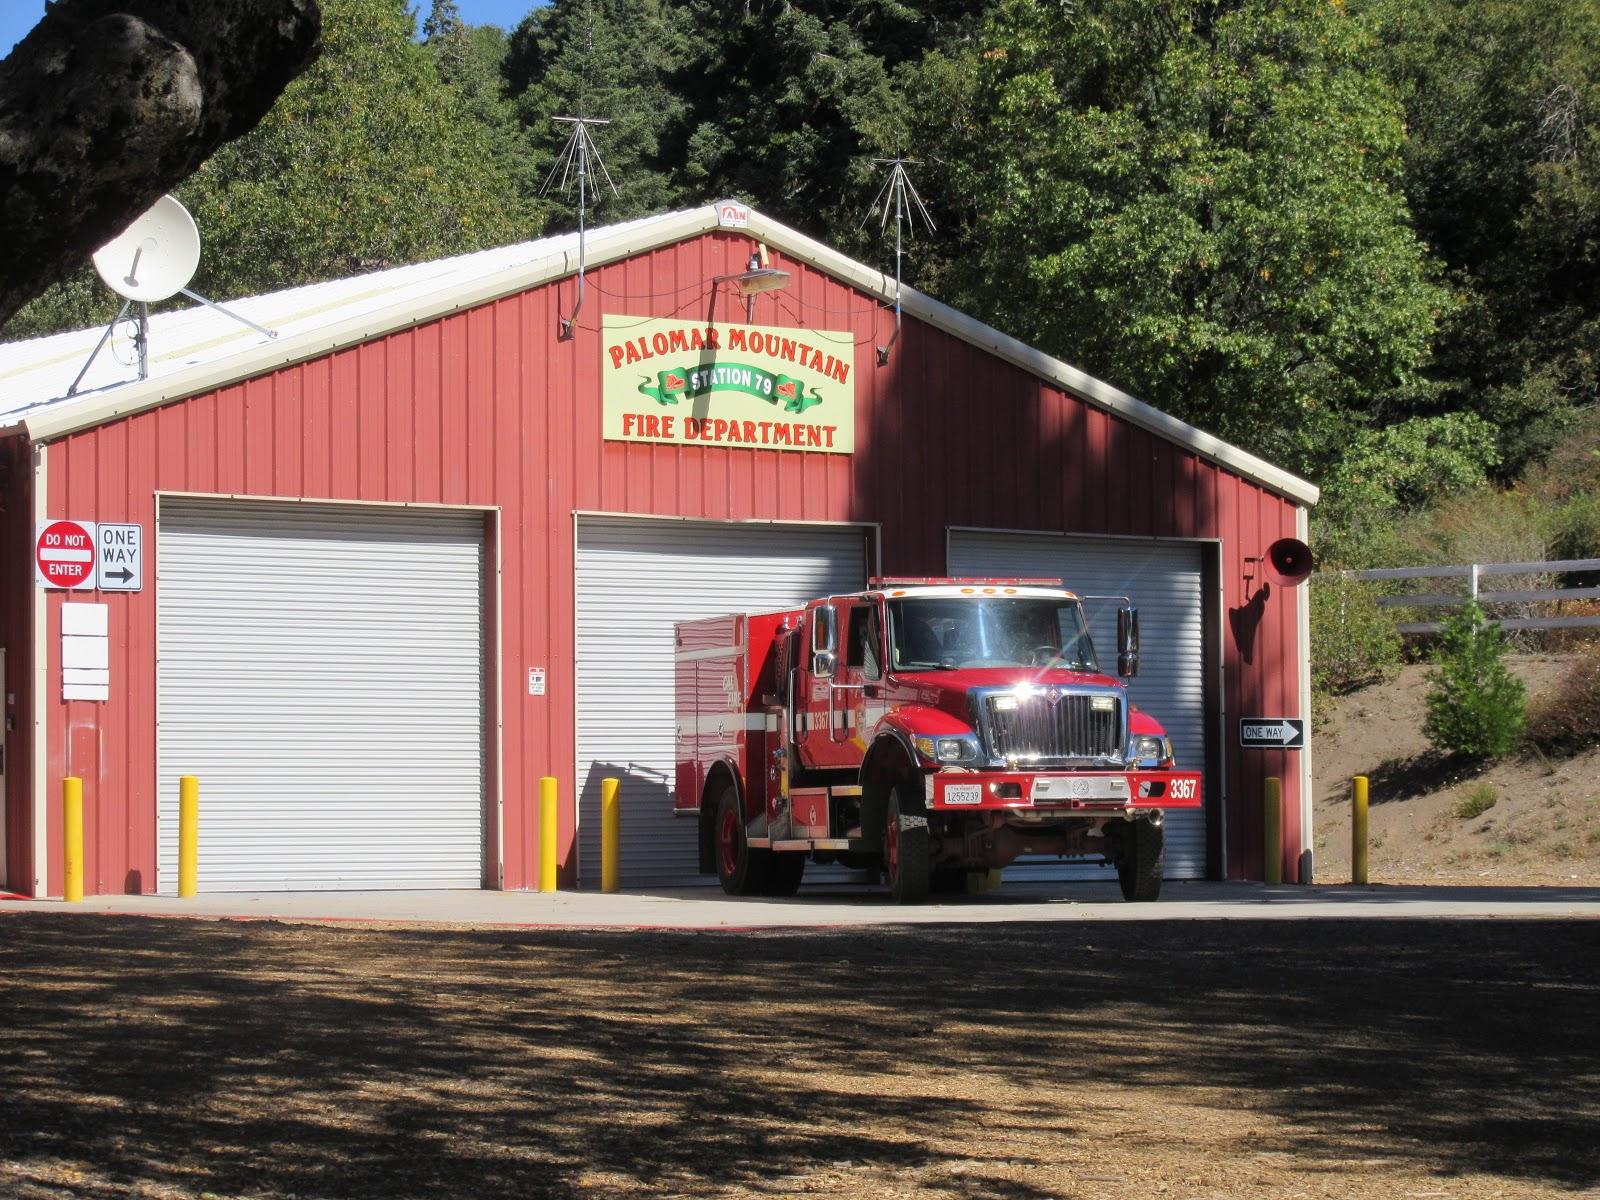 Mt Palomar Fire Station